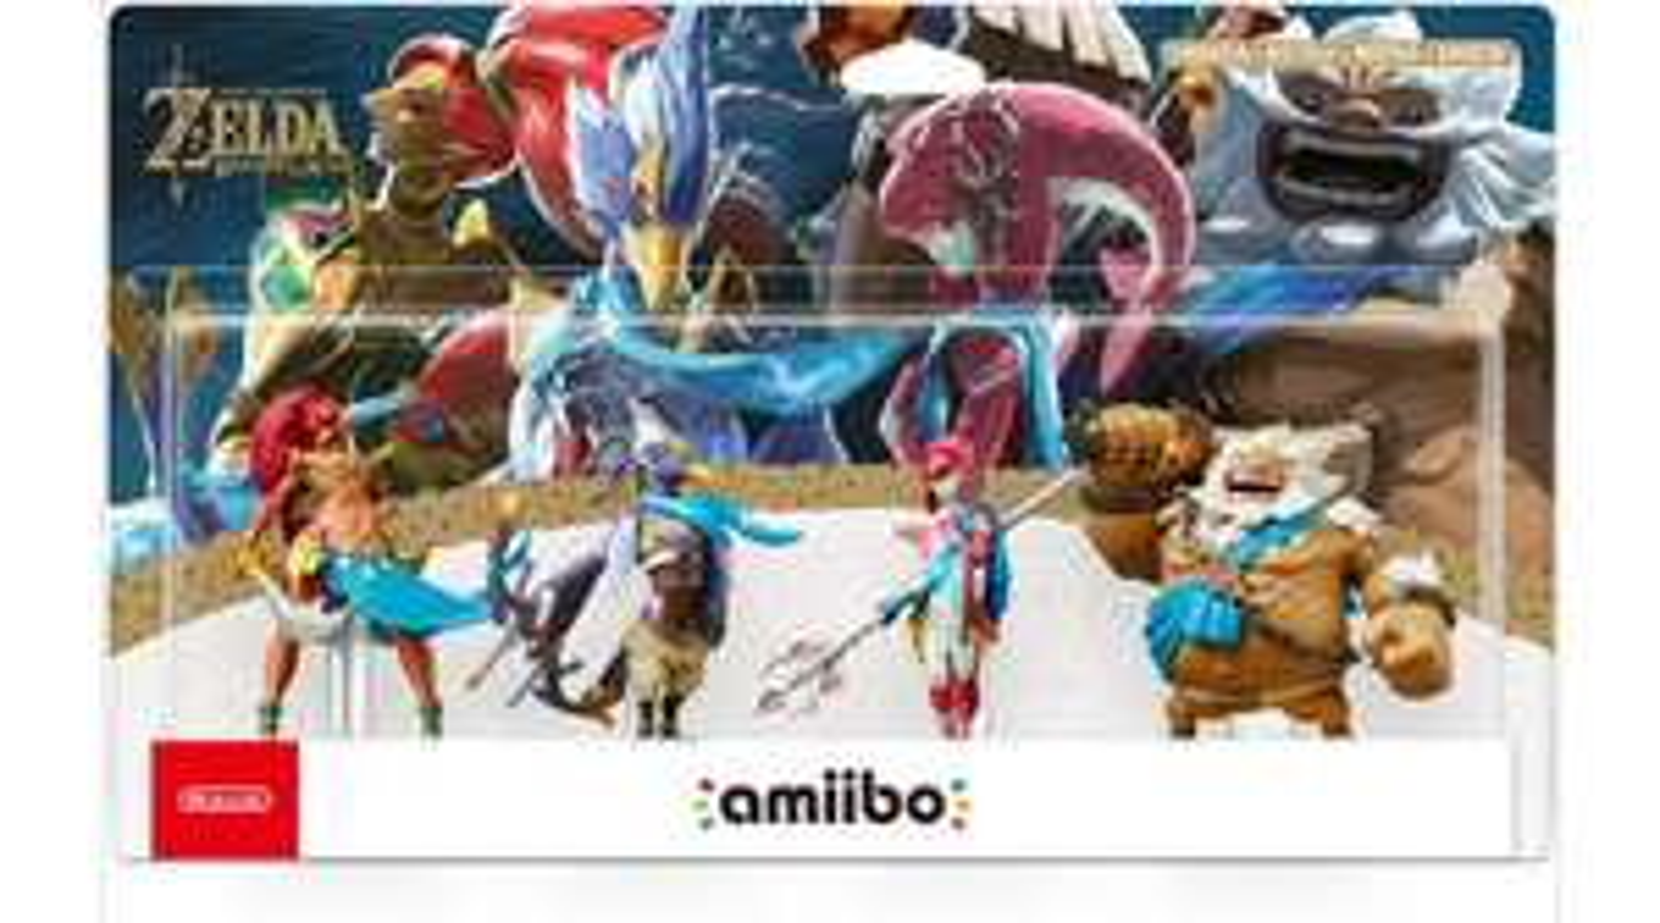 Pack de 4 figurines Nintendo Amiibo Nintendo : Prodiges Zelda Breath of the Wild